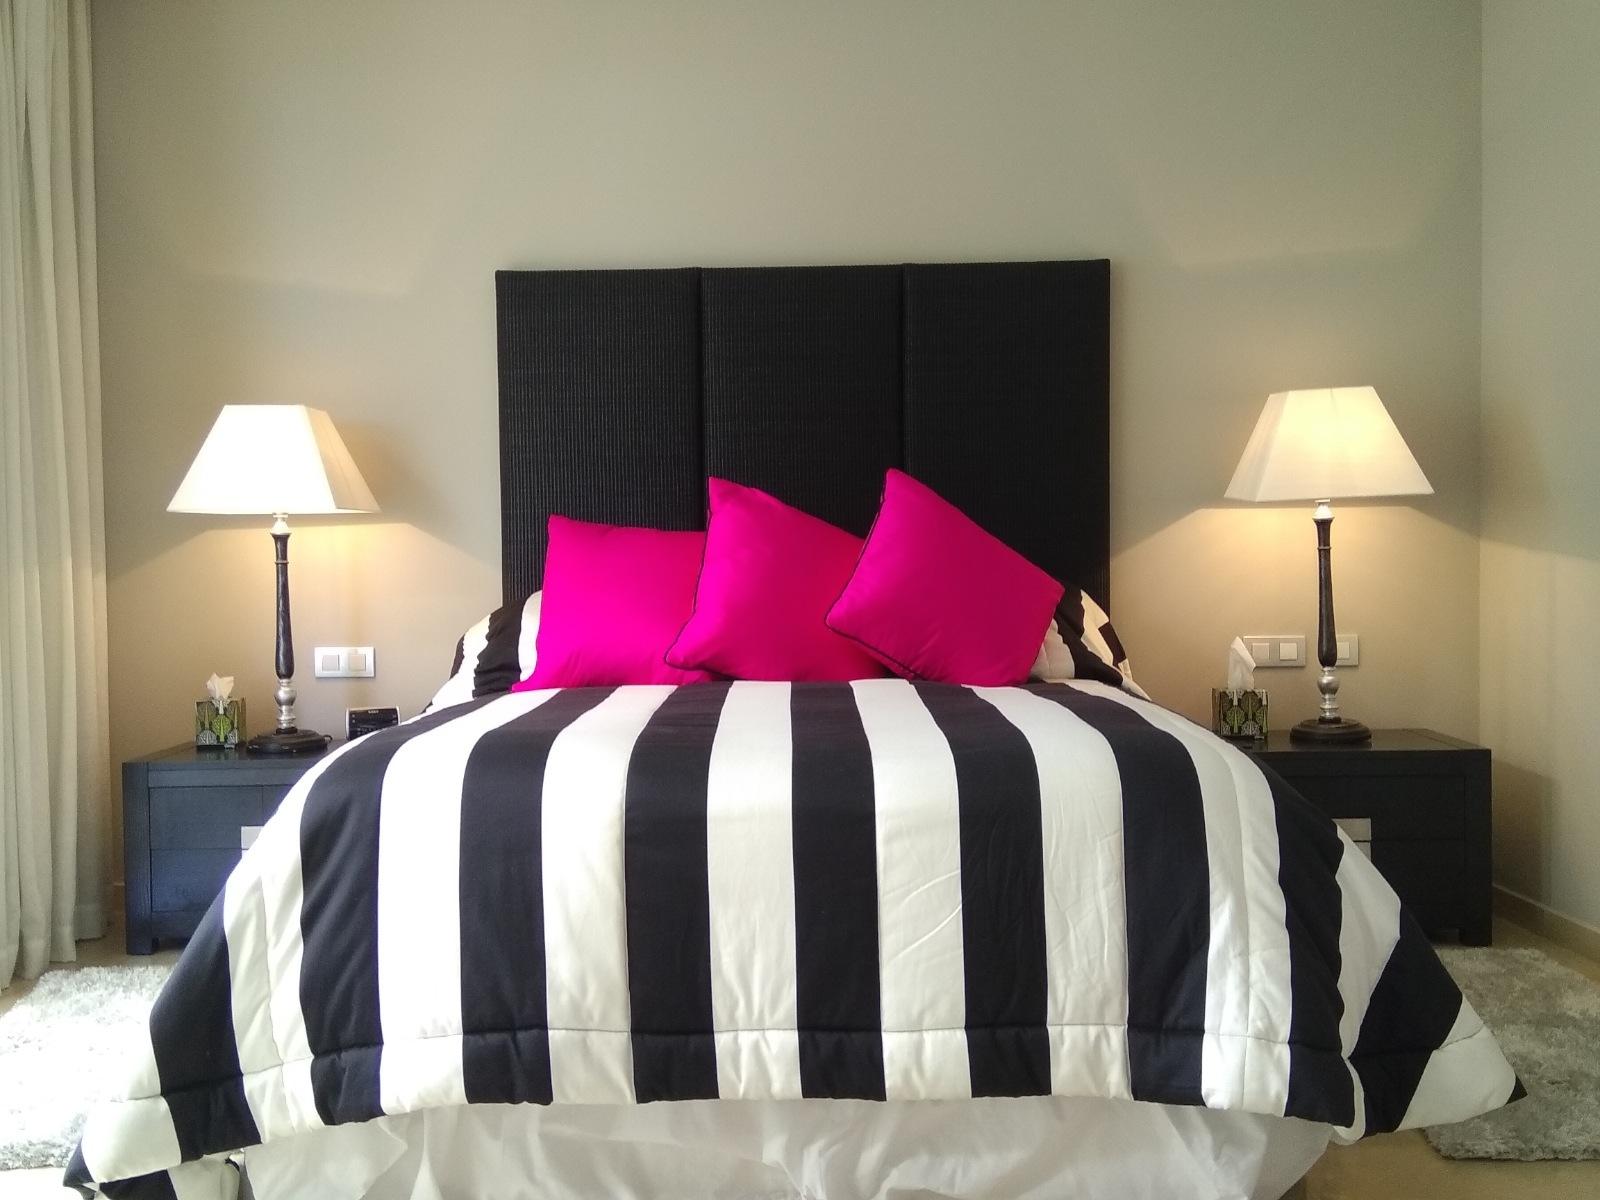 Imara 1 bed - 1